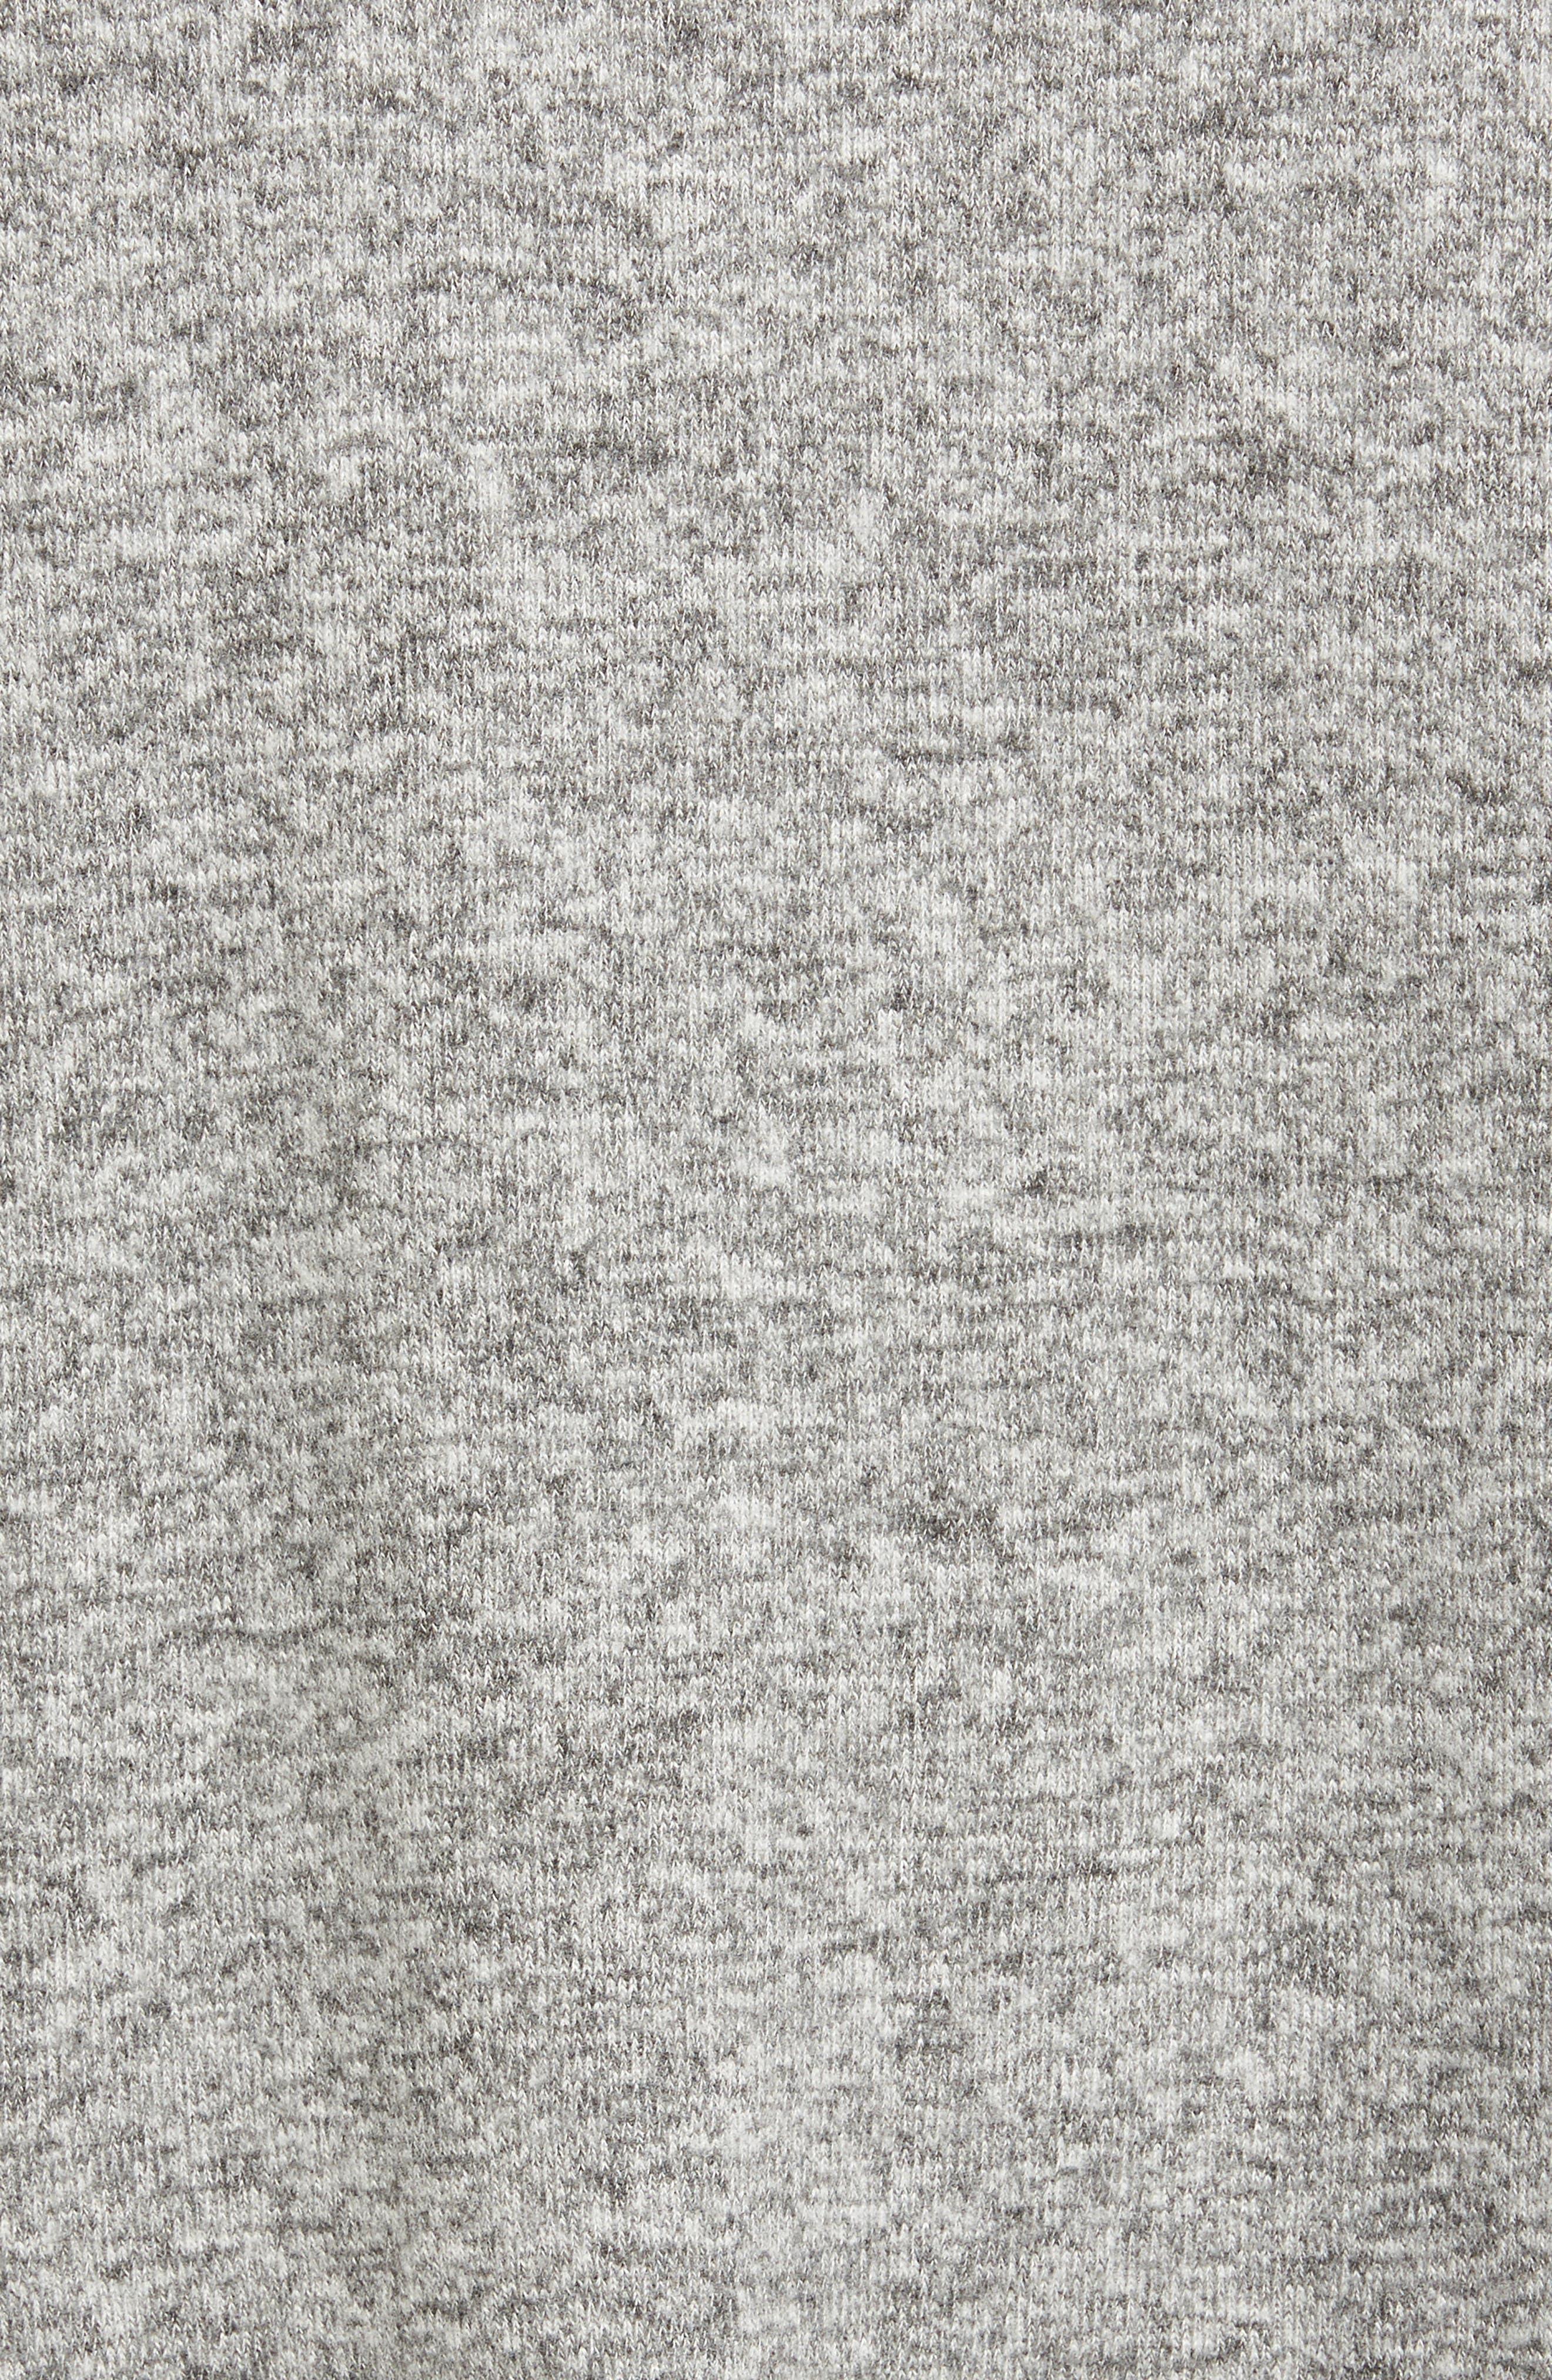 Bell Sleeve Cozy Fleece Pullover,                             Alternate thumbnail 55, color,